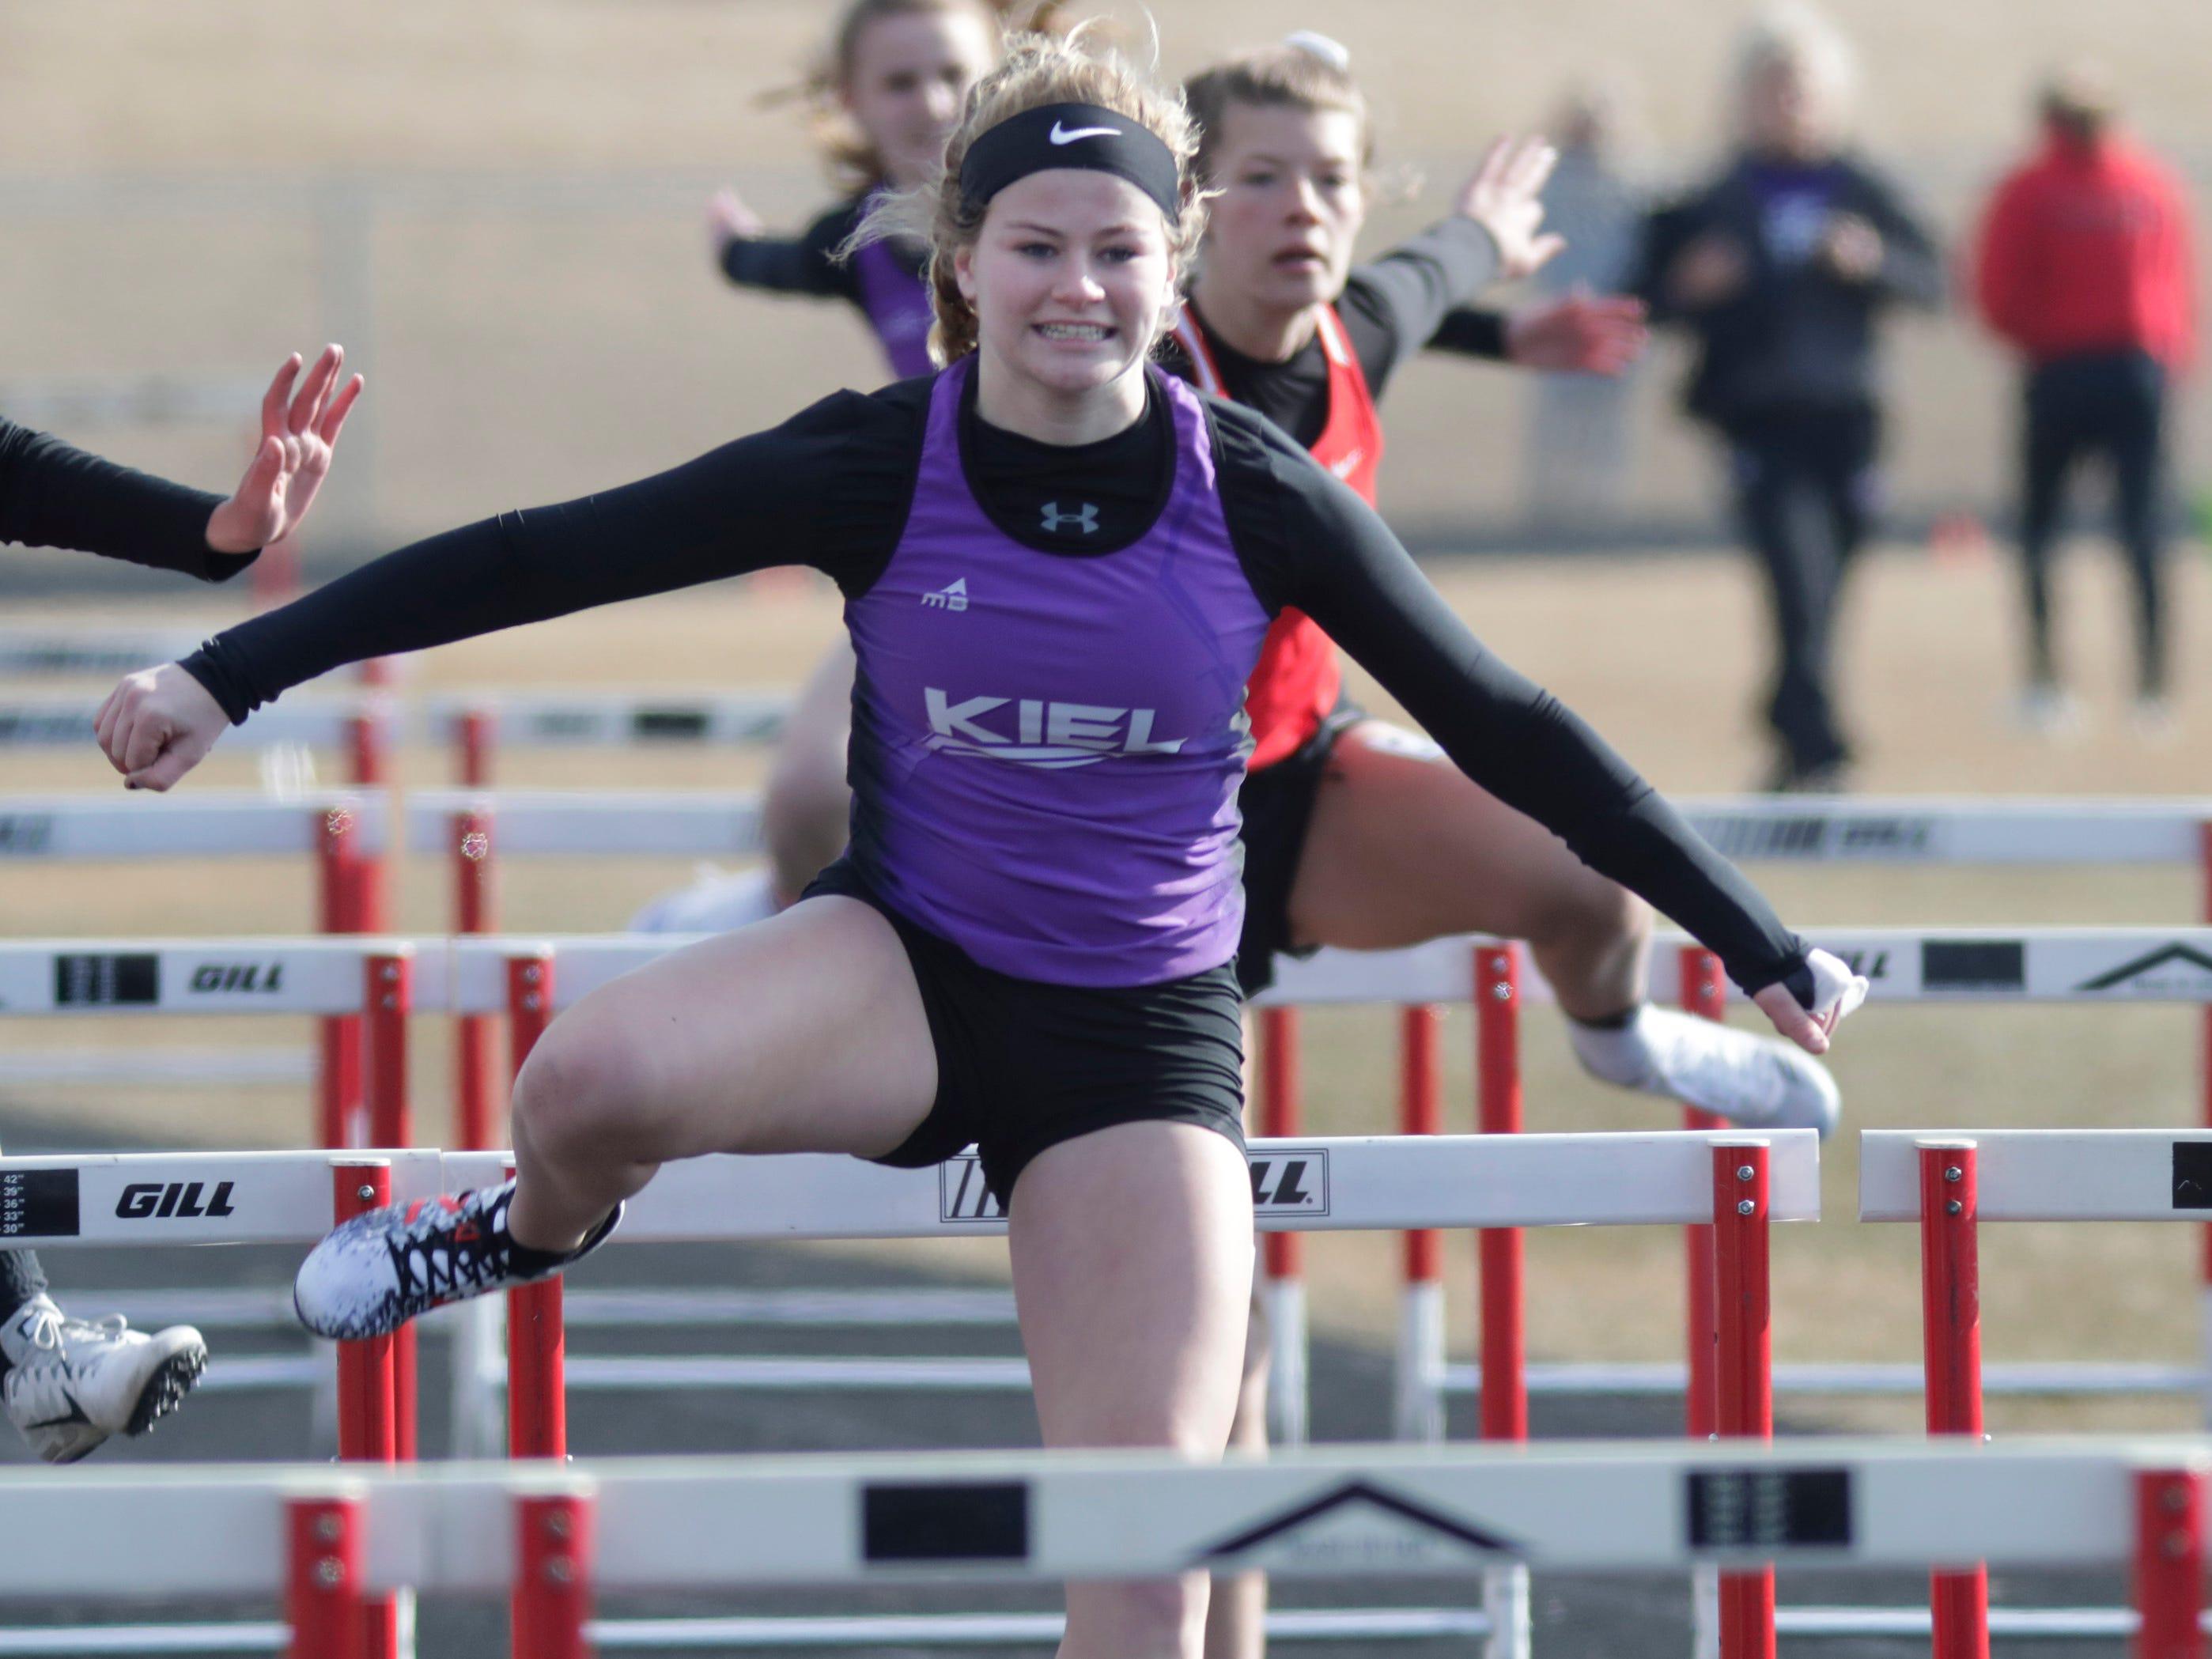 Kiel's Caitlin Kravick runs the 100 meter high hurdles at the Flying Dutchmen Invite, Friday, April 5, 2019, in Oostburg, Wis.